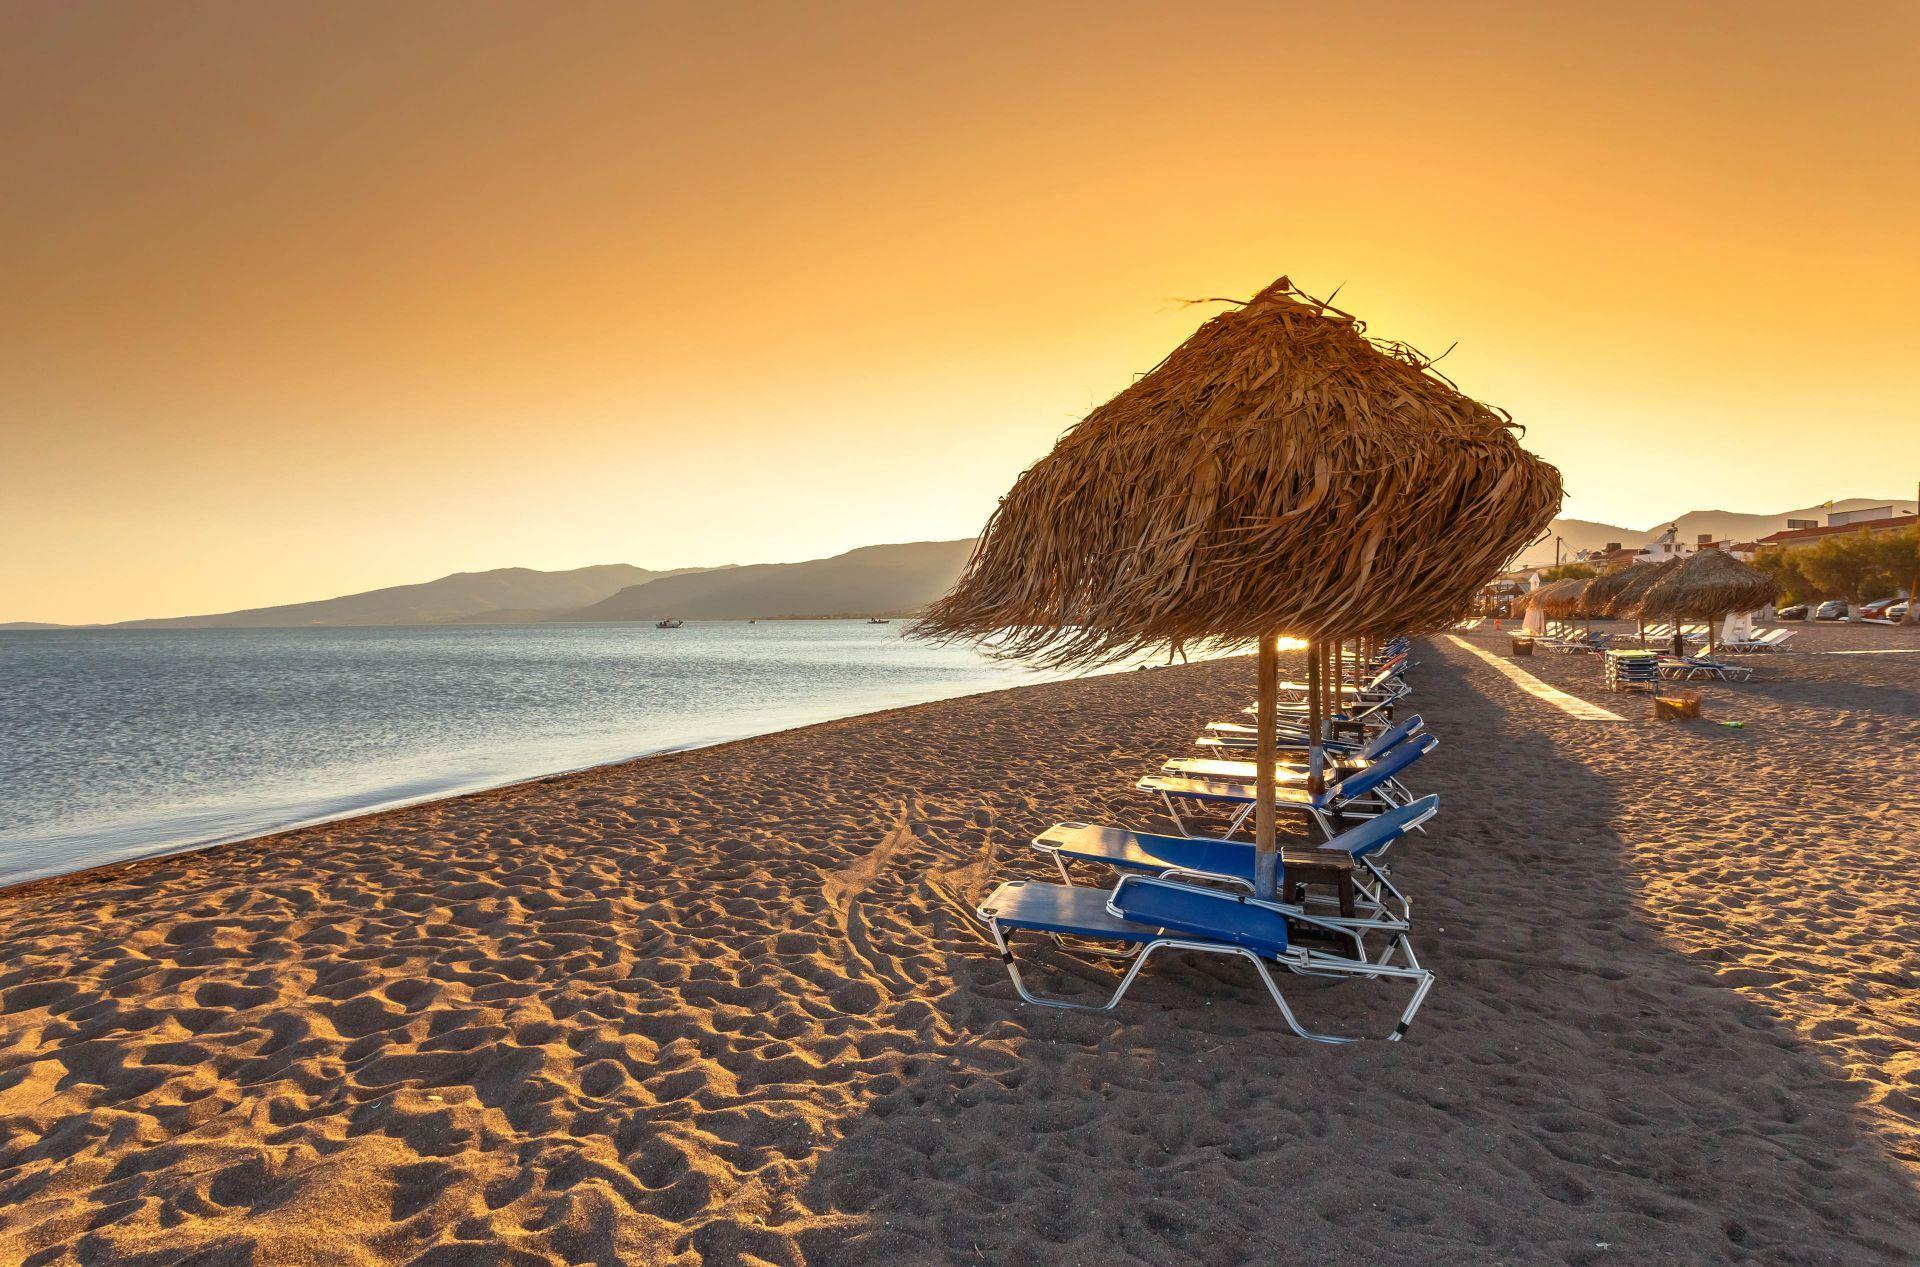 Eastern Aegean Greece: Lesvos beaches